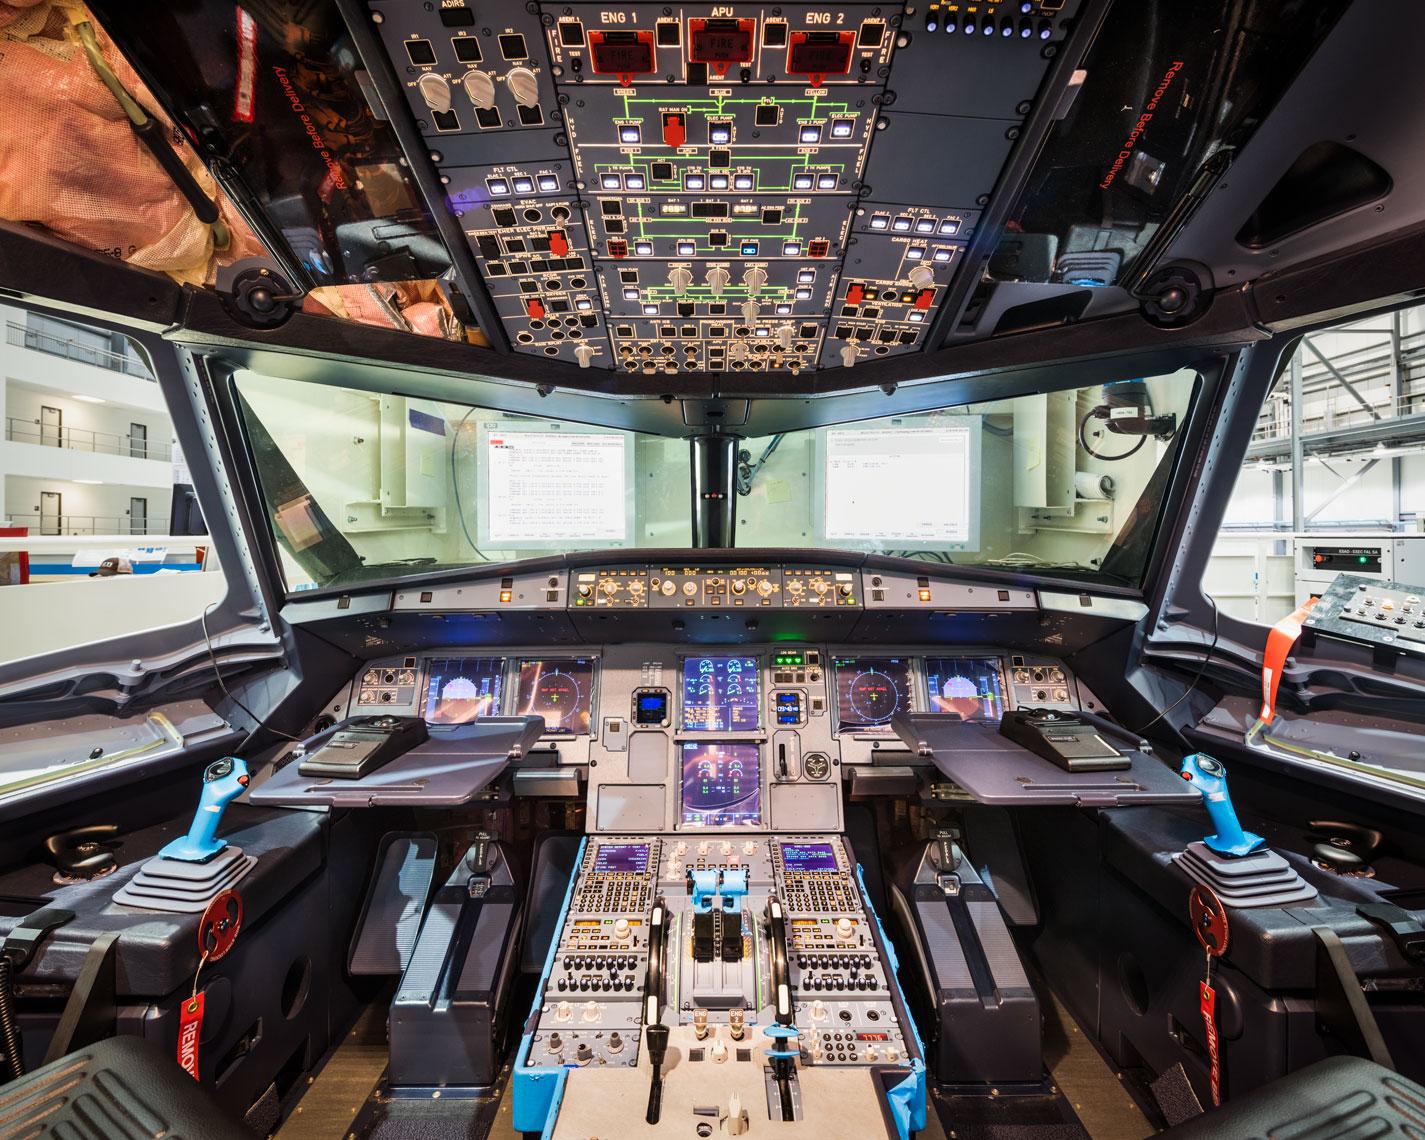 Payne_Airbus_8553.jpg